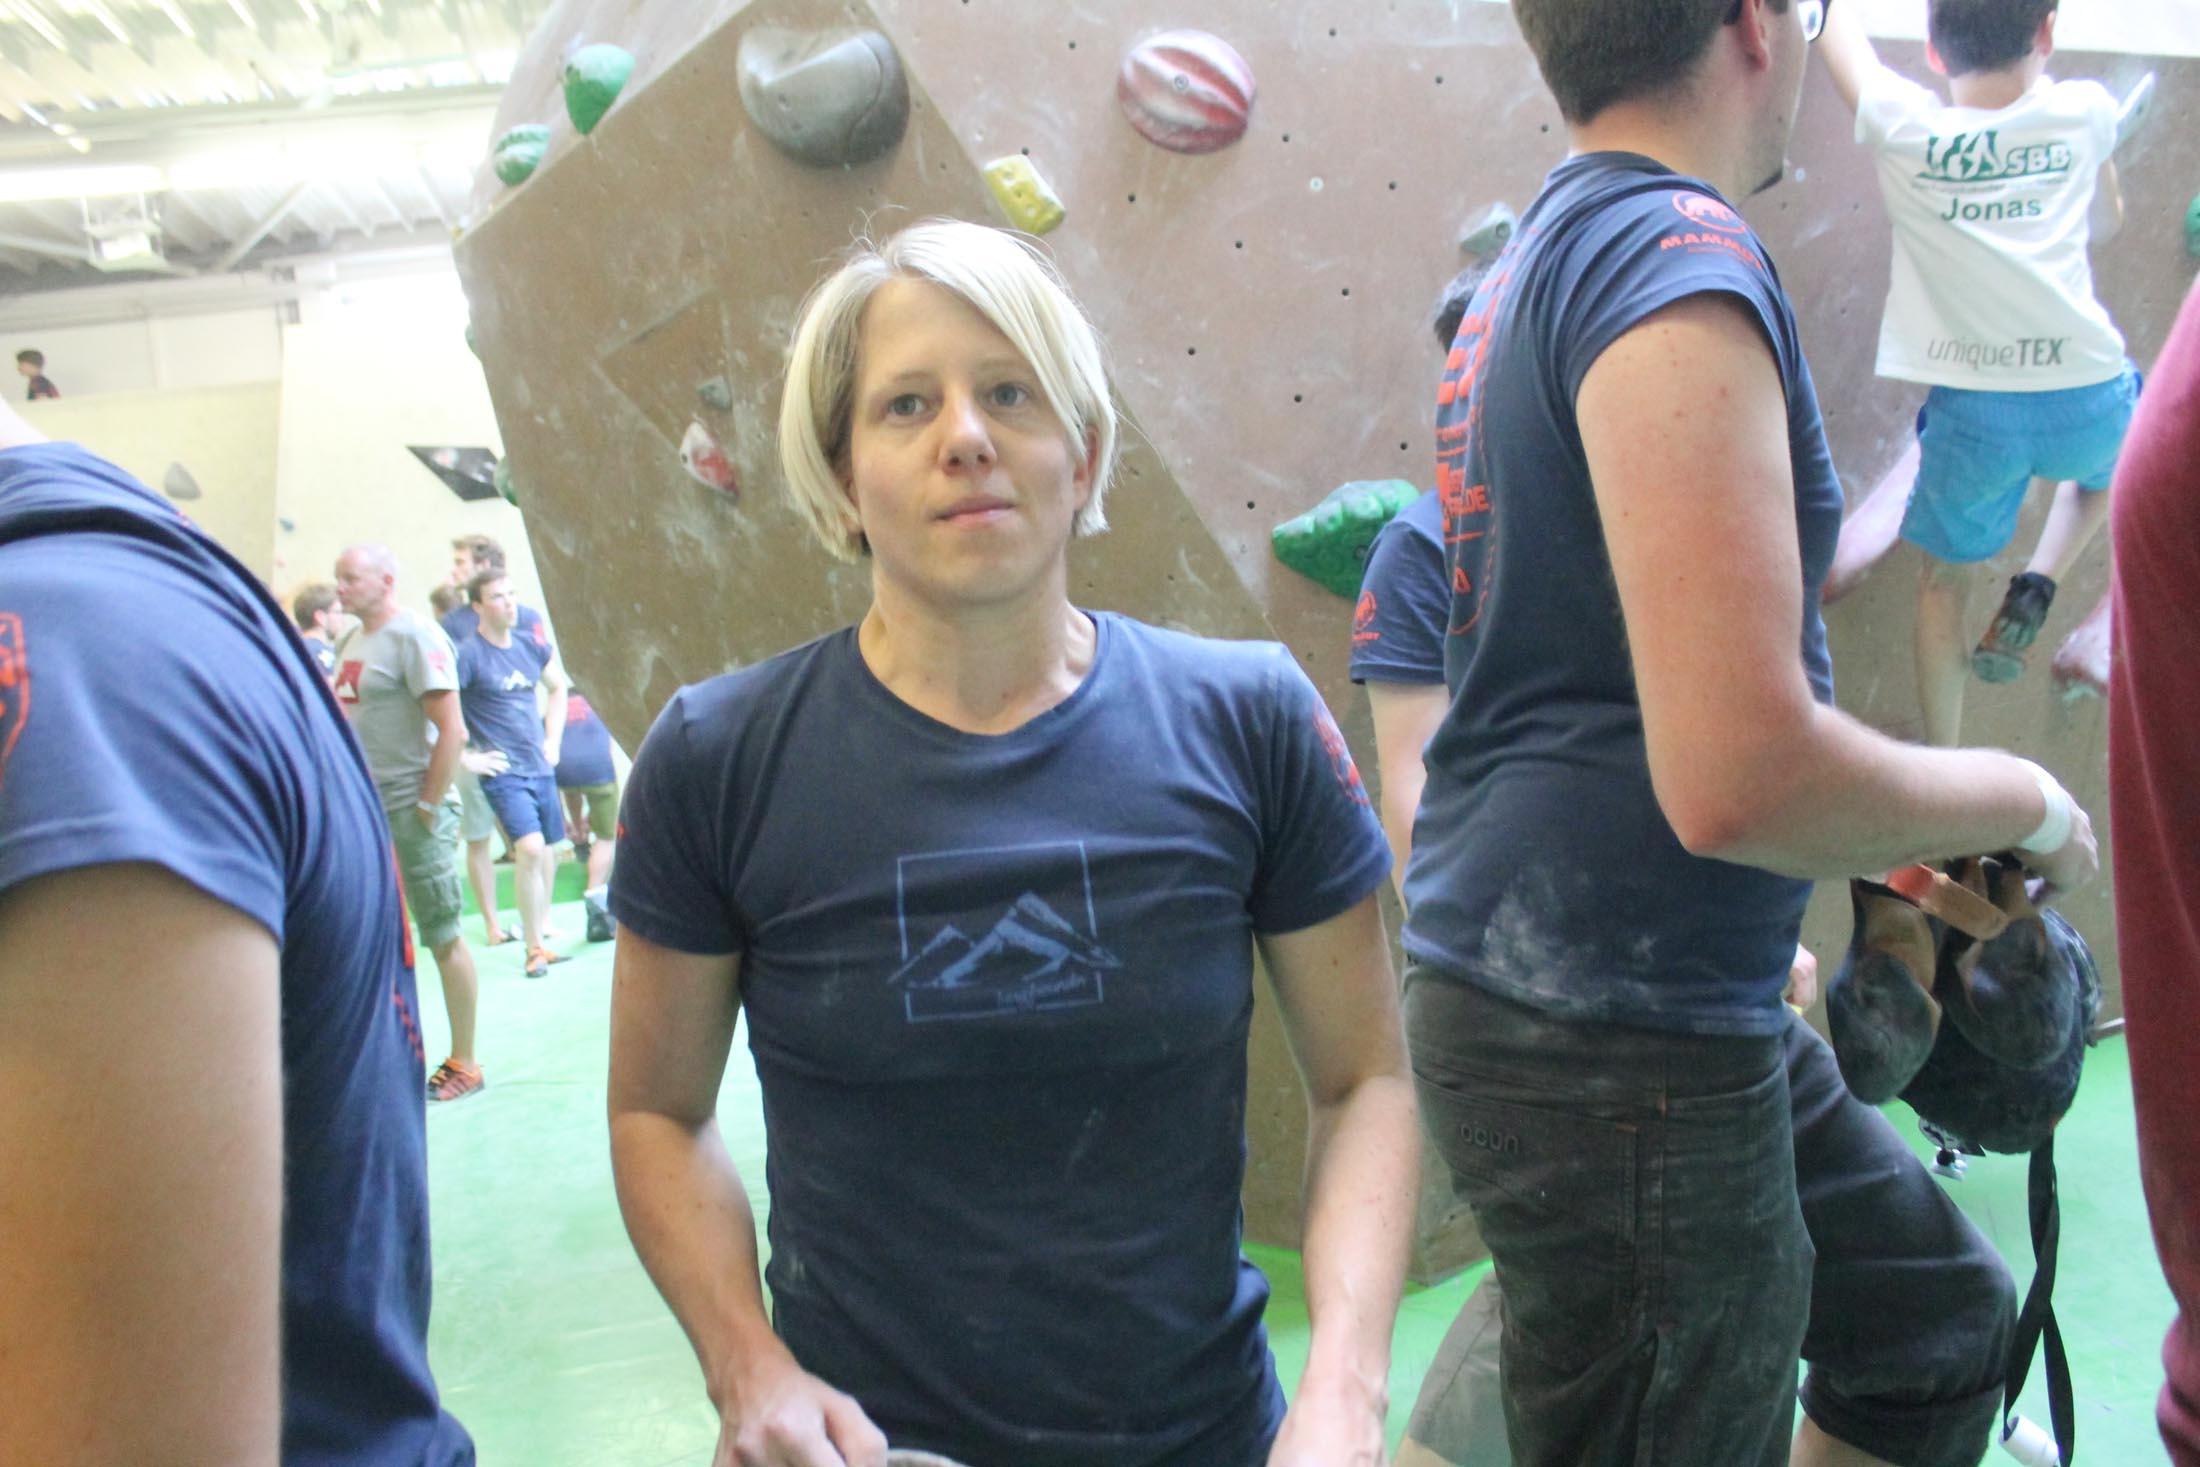 Quali, internationaler bouldercup Frankenjura 2016, BLOCKHELDEN Erlangen, Mammut, Bergfreunde.de, Boulderwettkampf07092016276